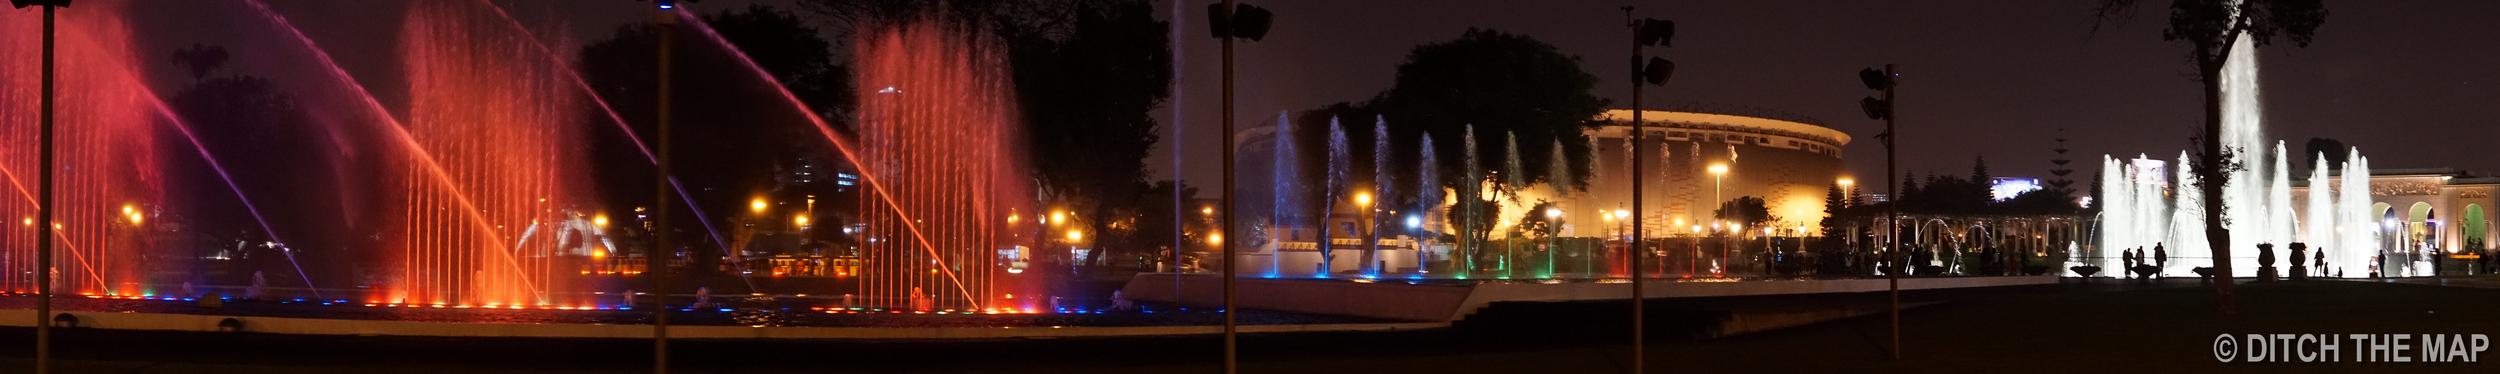 Magic Water Circuit in Lima, Peru